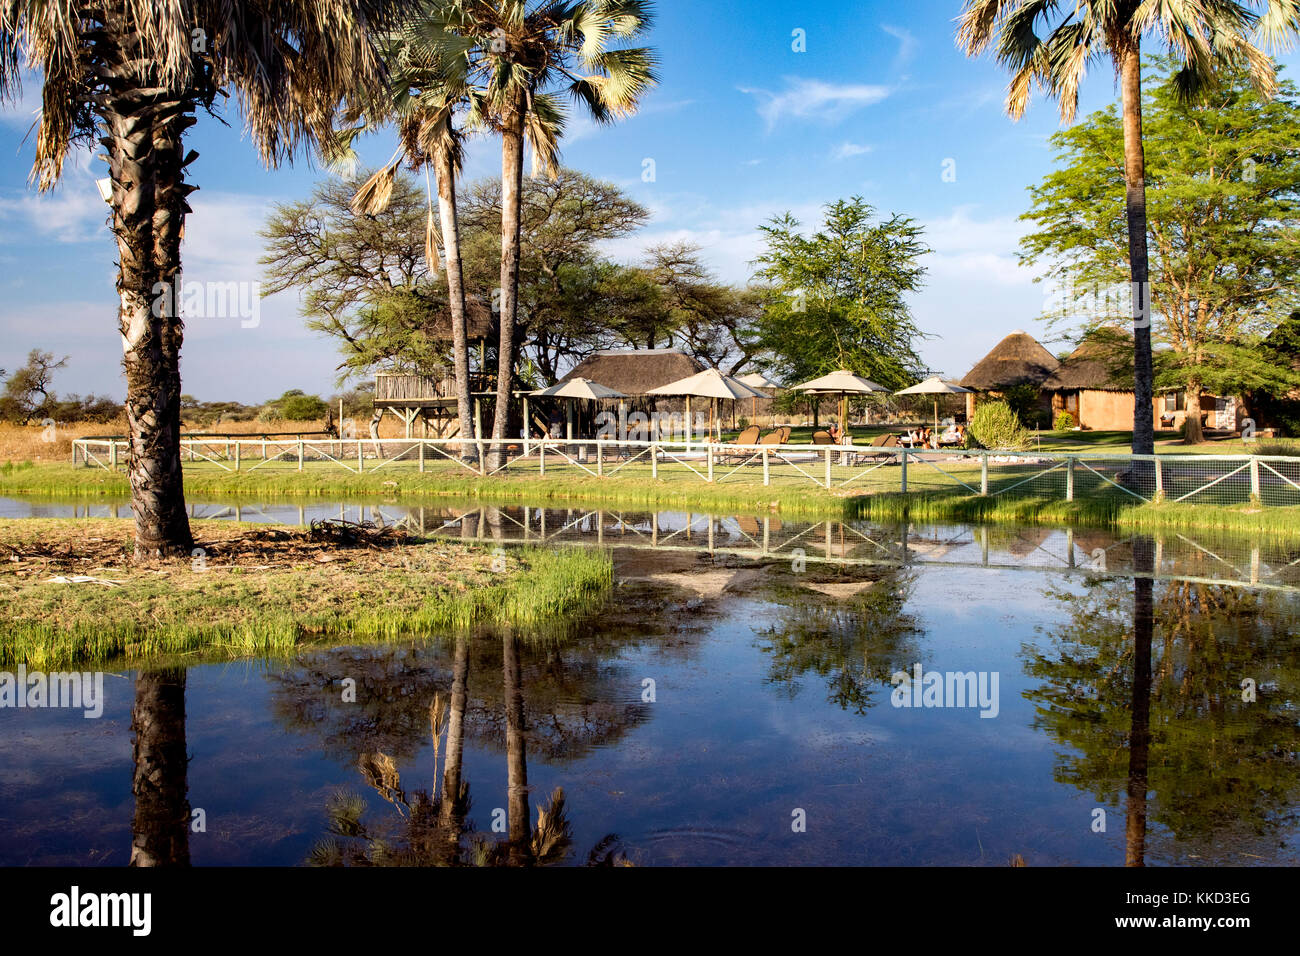 Abrevadero en onguma bush camp, onguma Game Reserve, Namibia, África Foto de stock